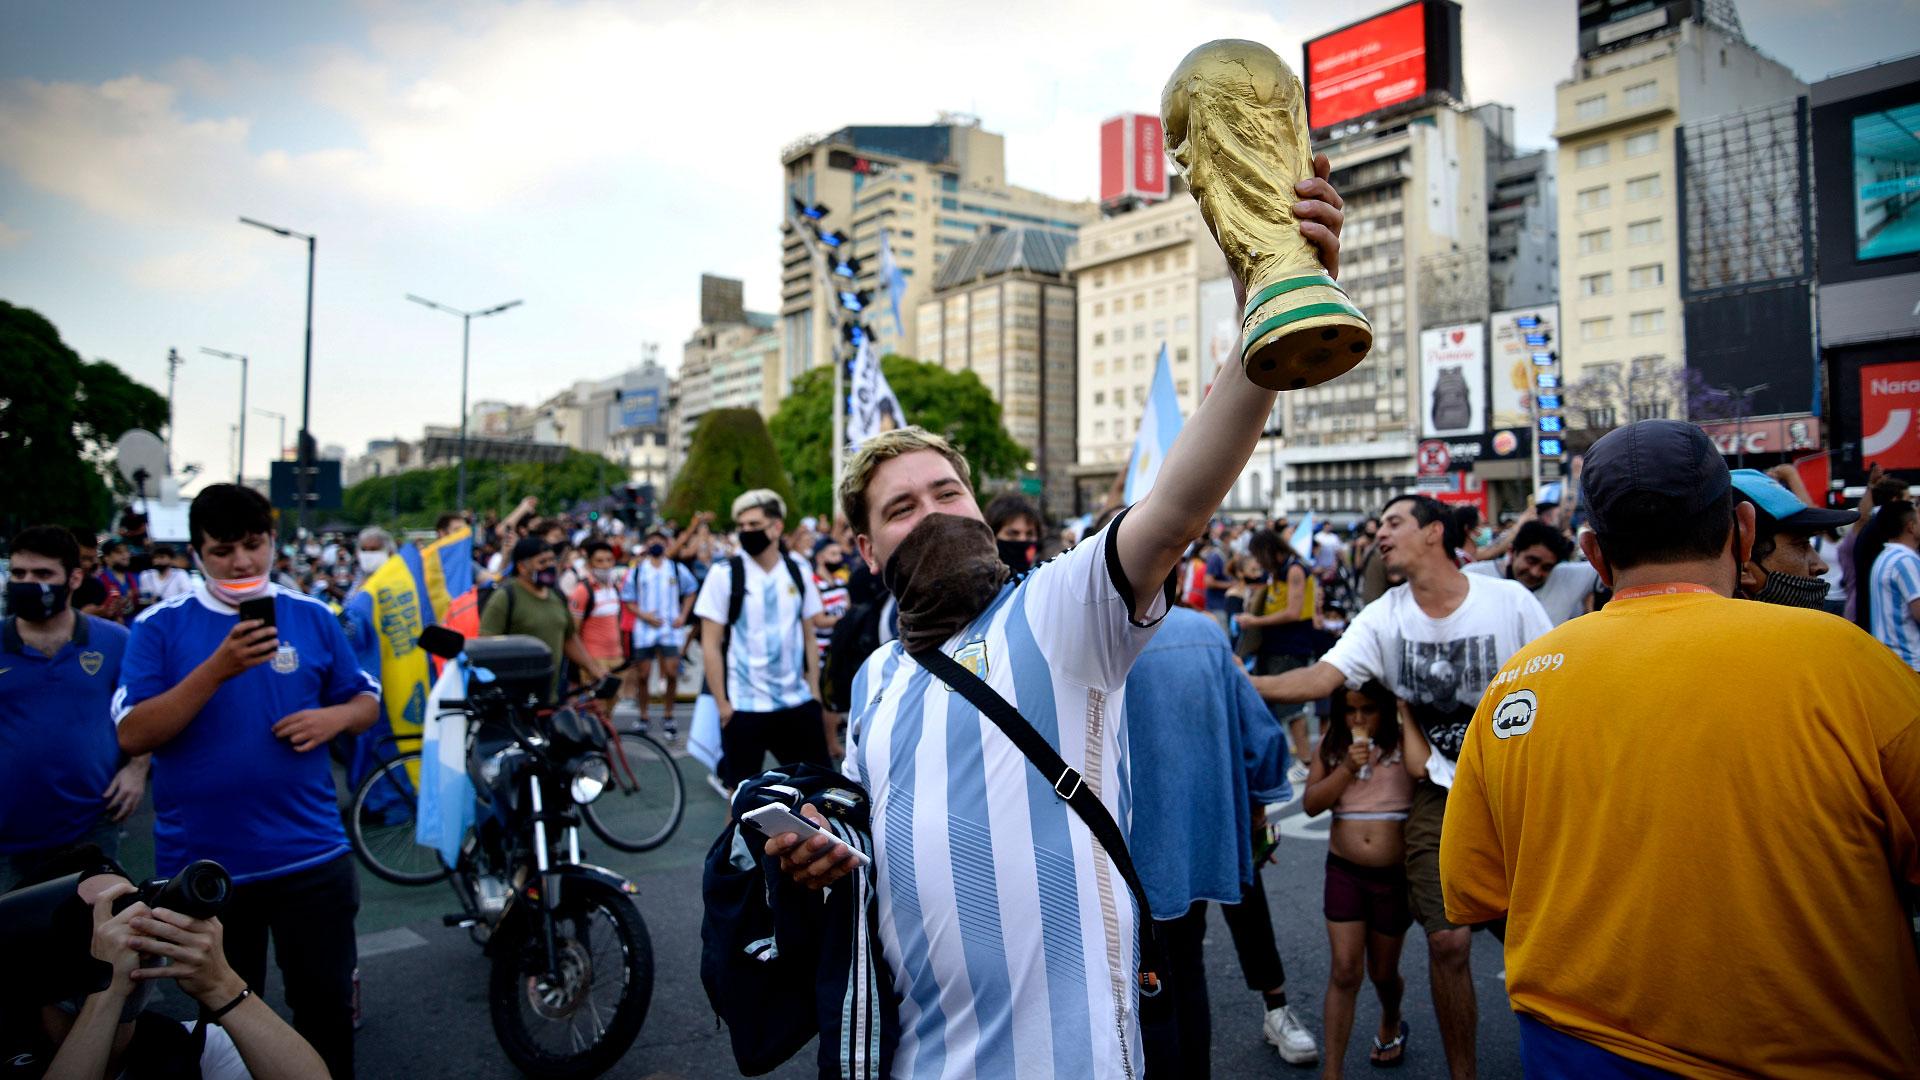 La Copa del Mundo, infaltable en los homenajes (Gustavo Gavotti)